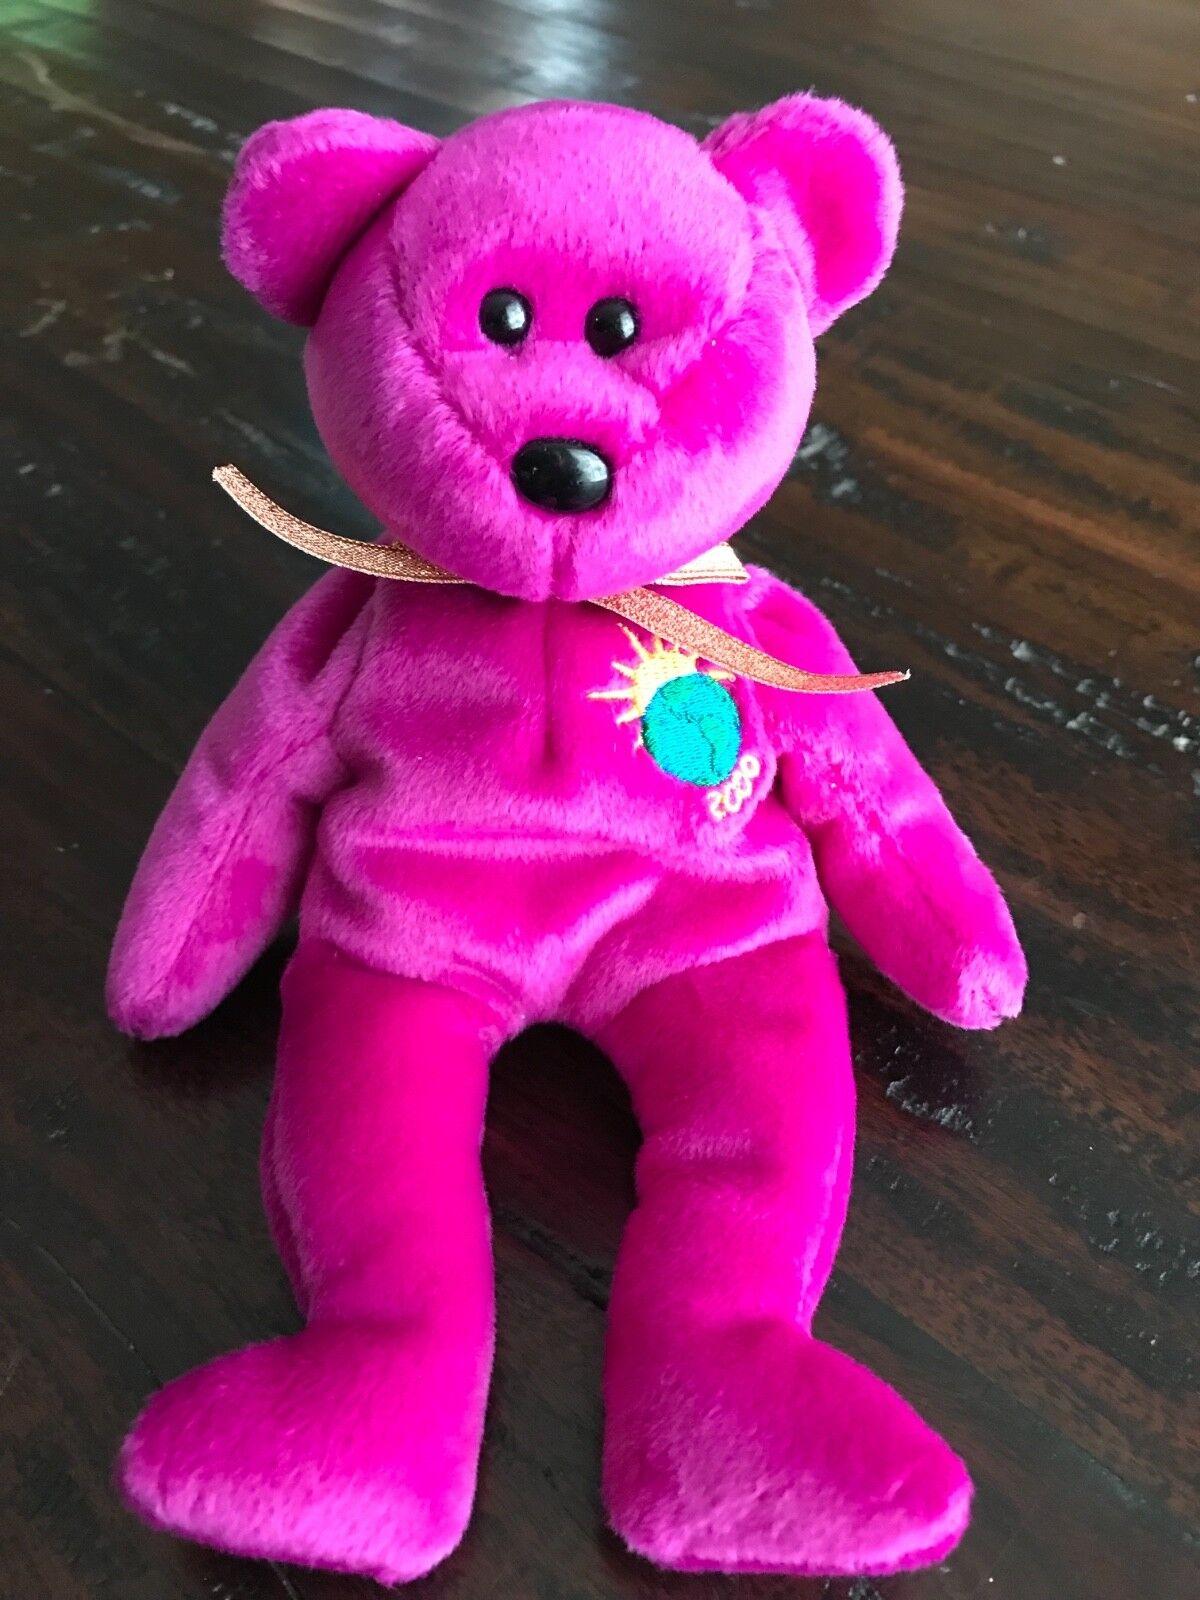 TY BEANIE BABY Millennium Millenium Bear 1999 Very Rare